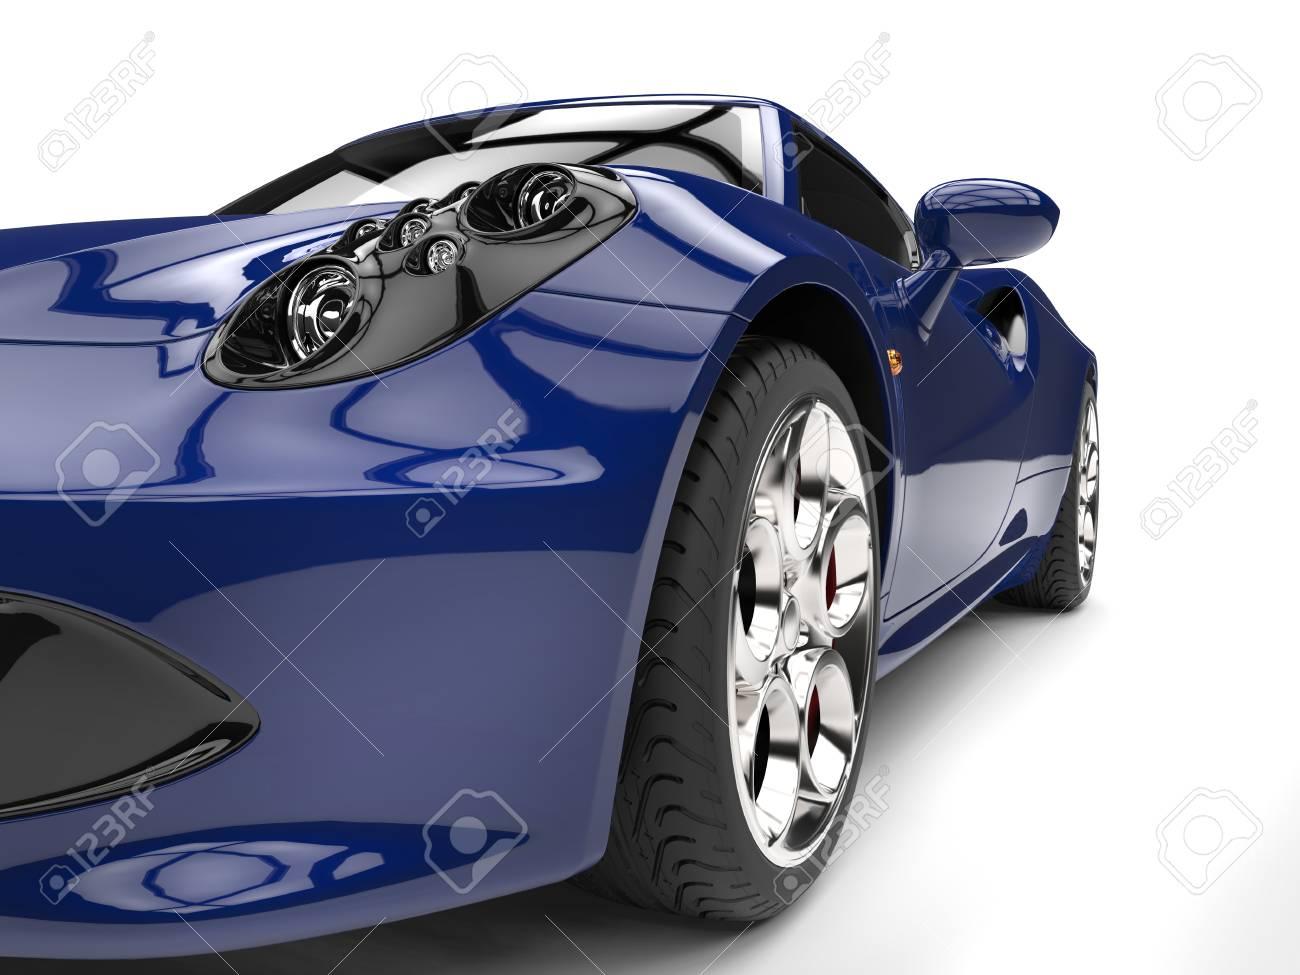 Royal blue sports car - headlight extreme closeup shot